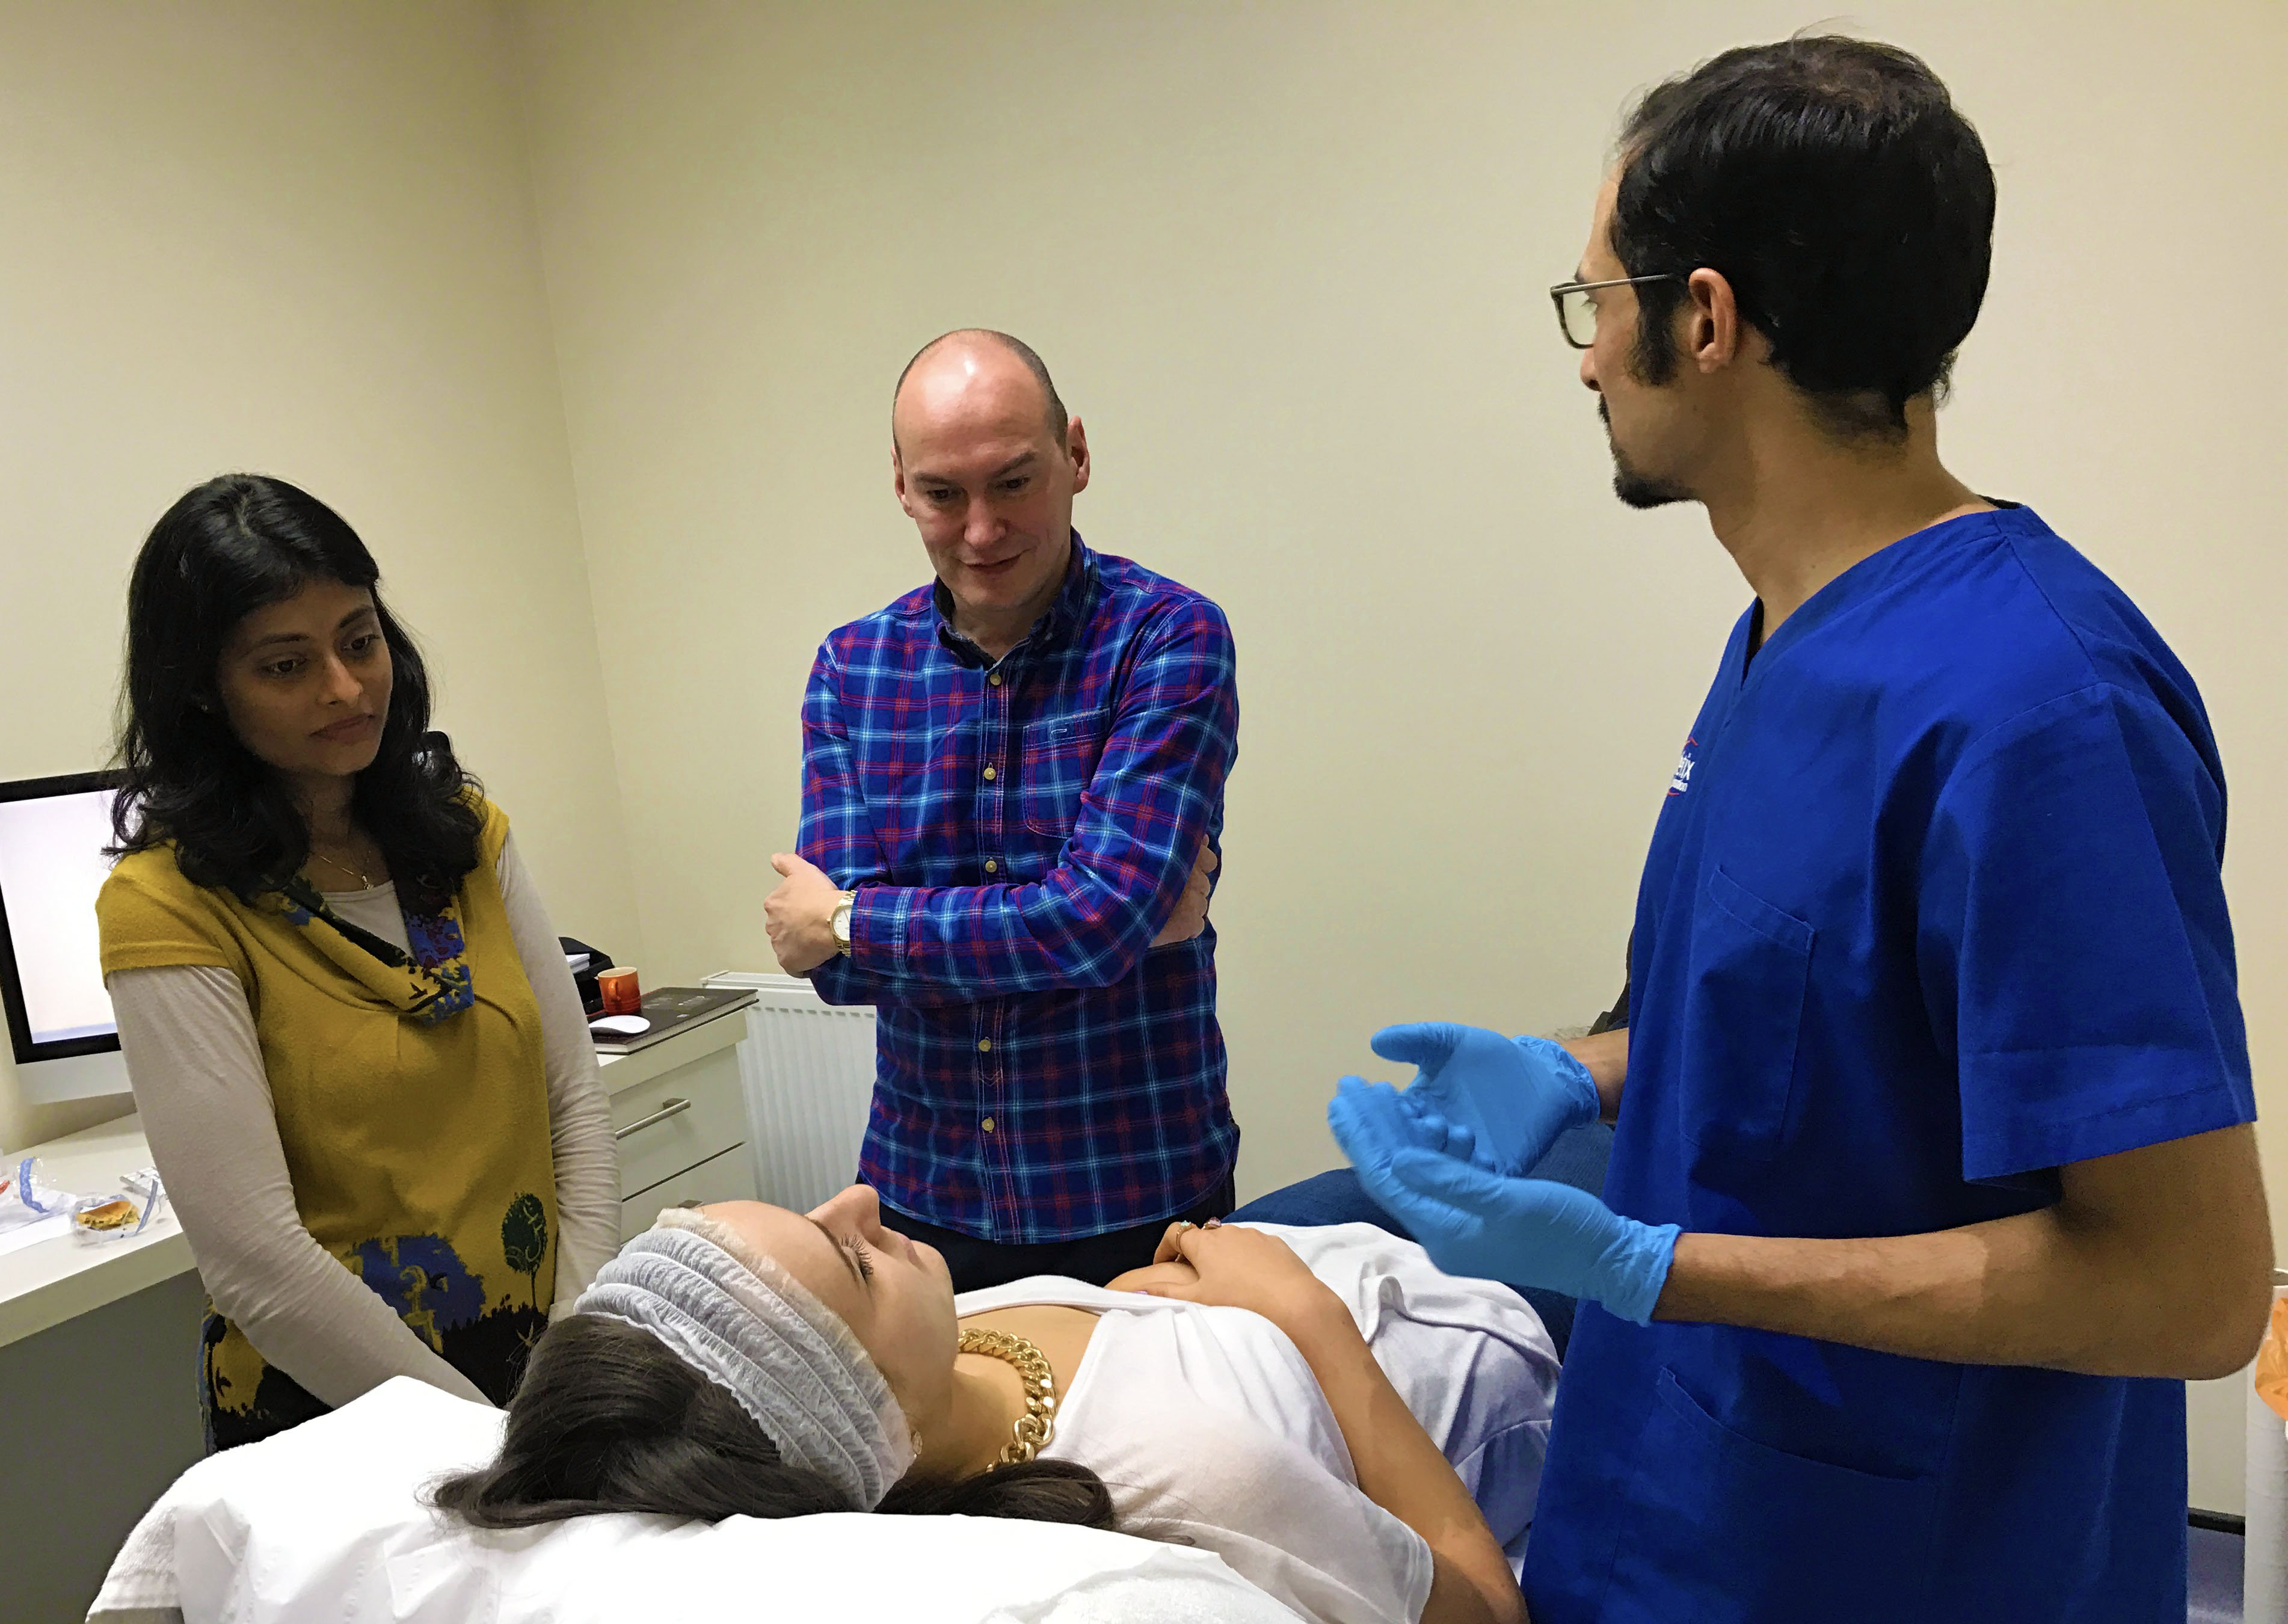 Aesthetic Medical Training at Clinetix | Clinetix